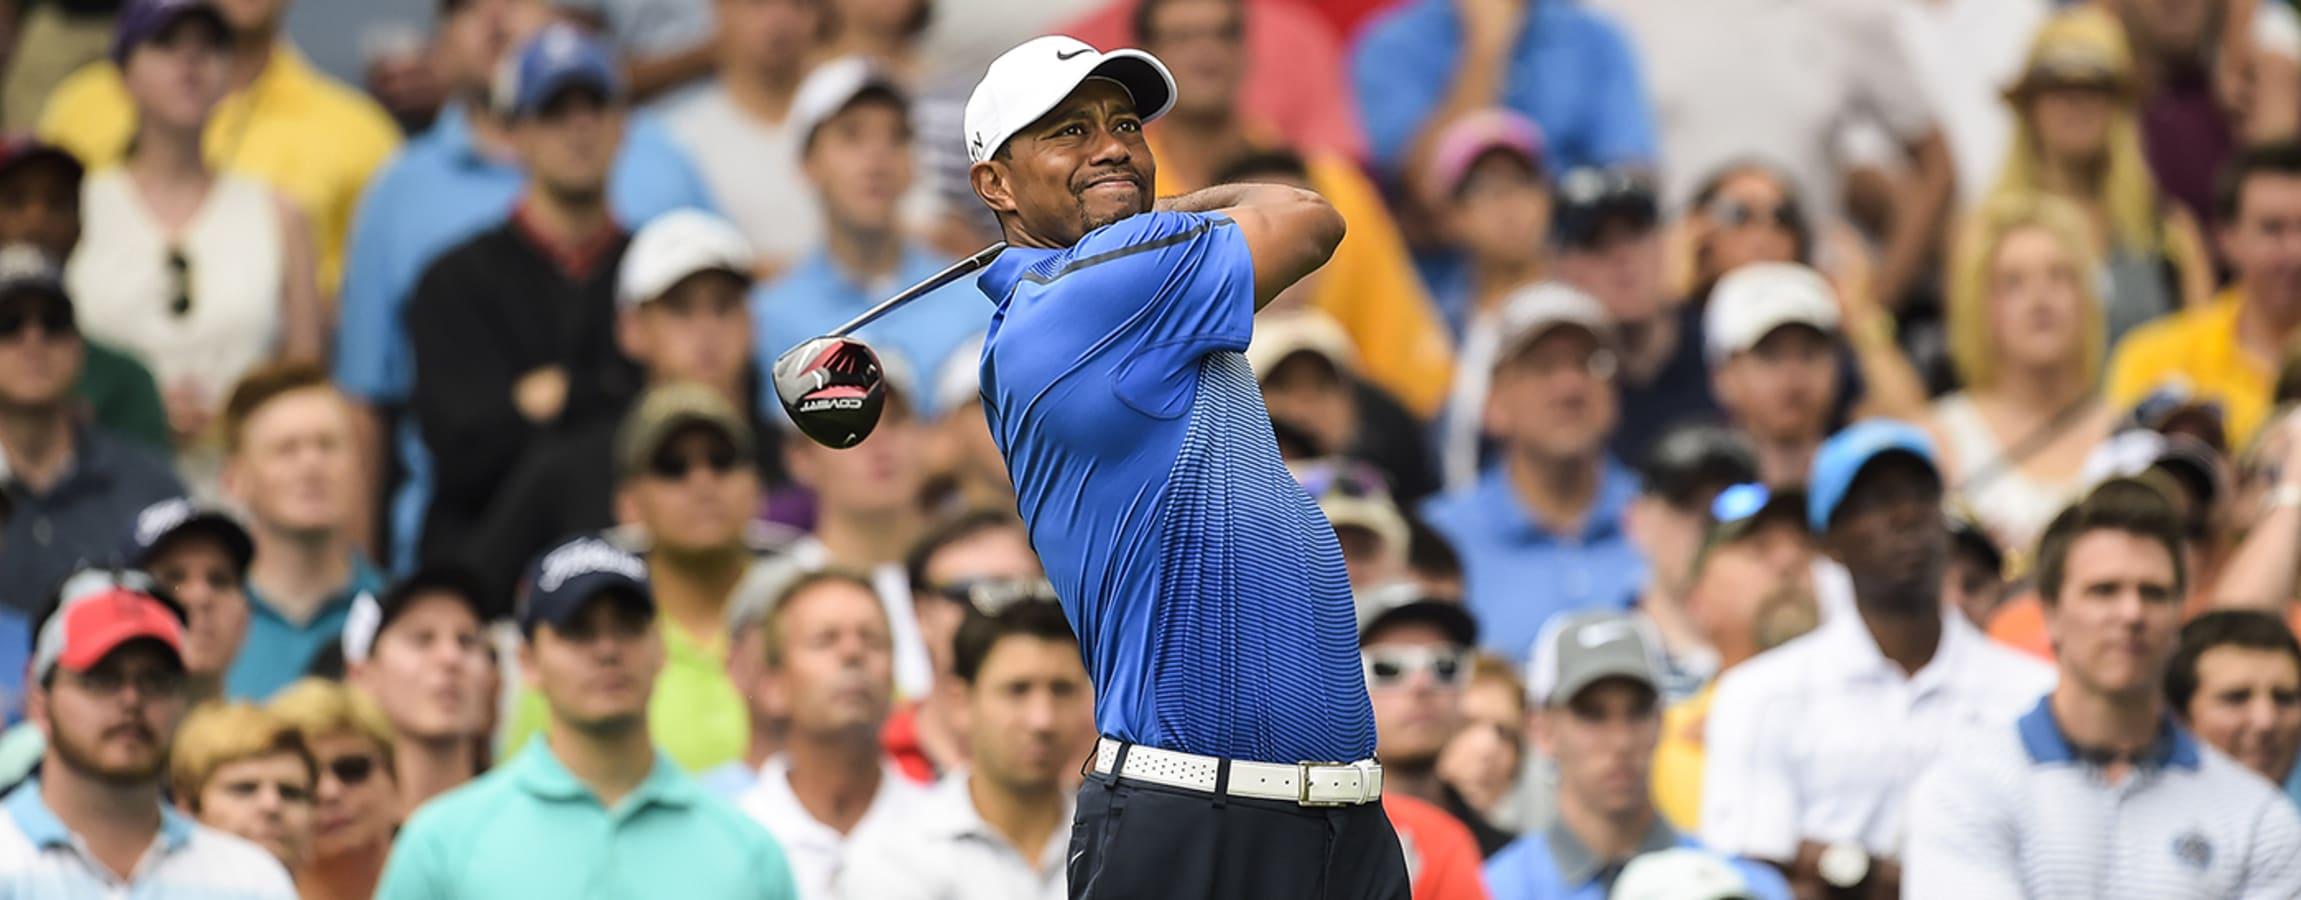 Tiger Woods qualifies for World Golf Championships-Bridgestone Invitational